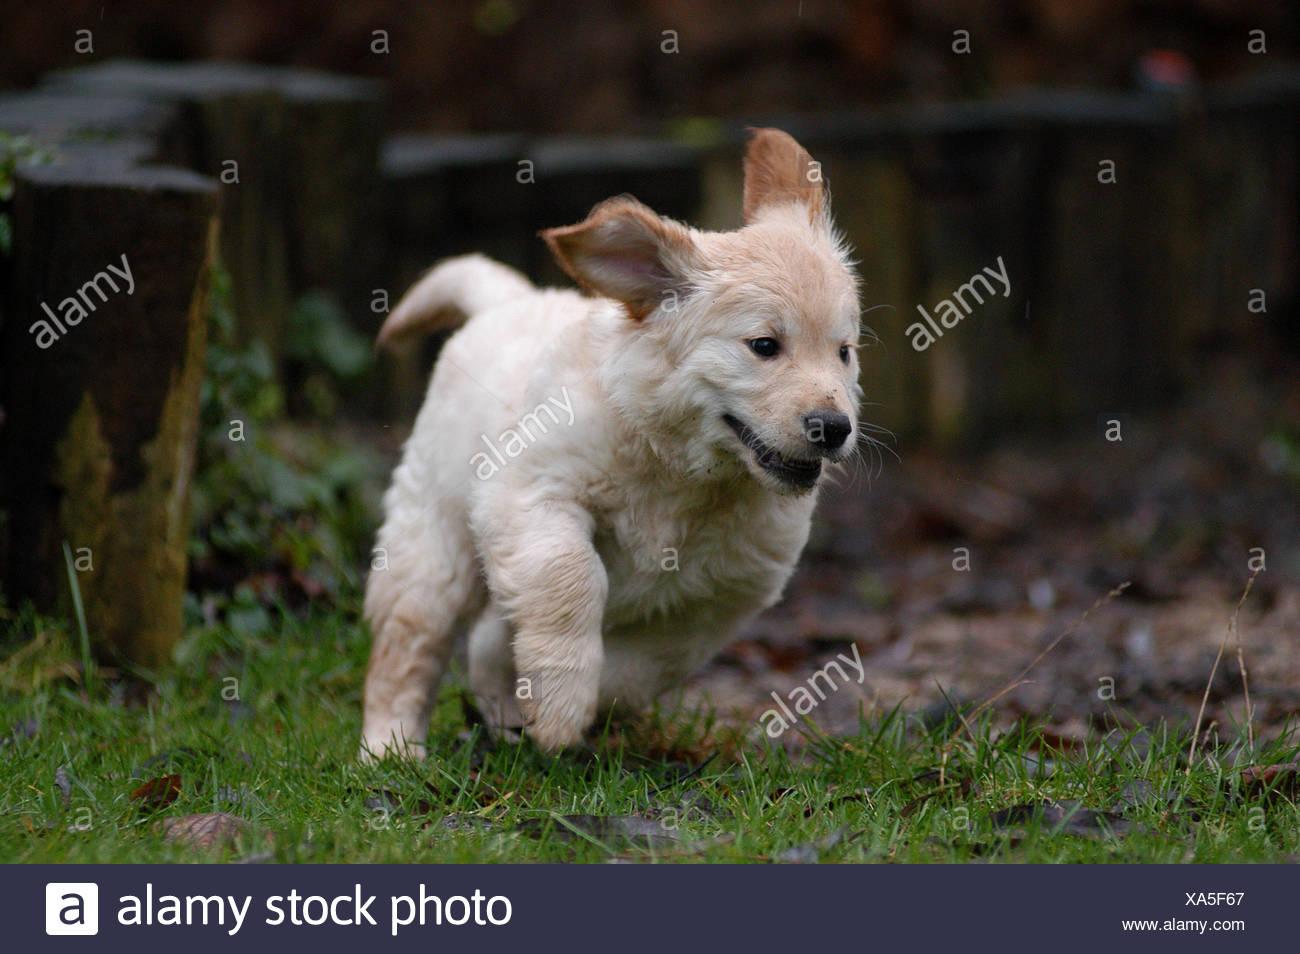 Golden Retriever Puppy Running Stock Photo 281634143 Alamy